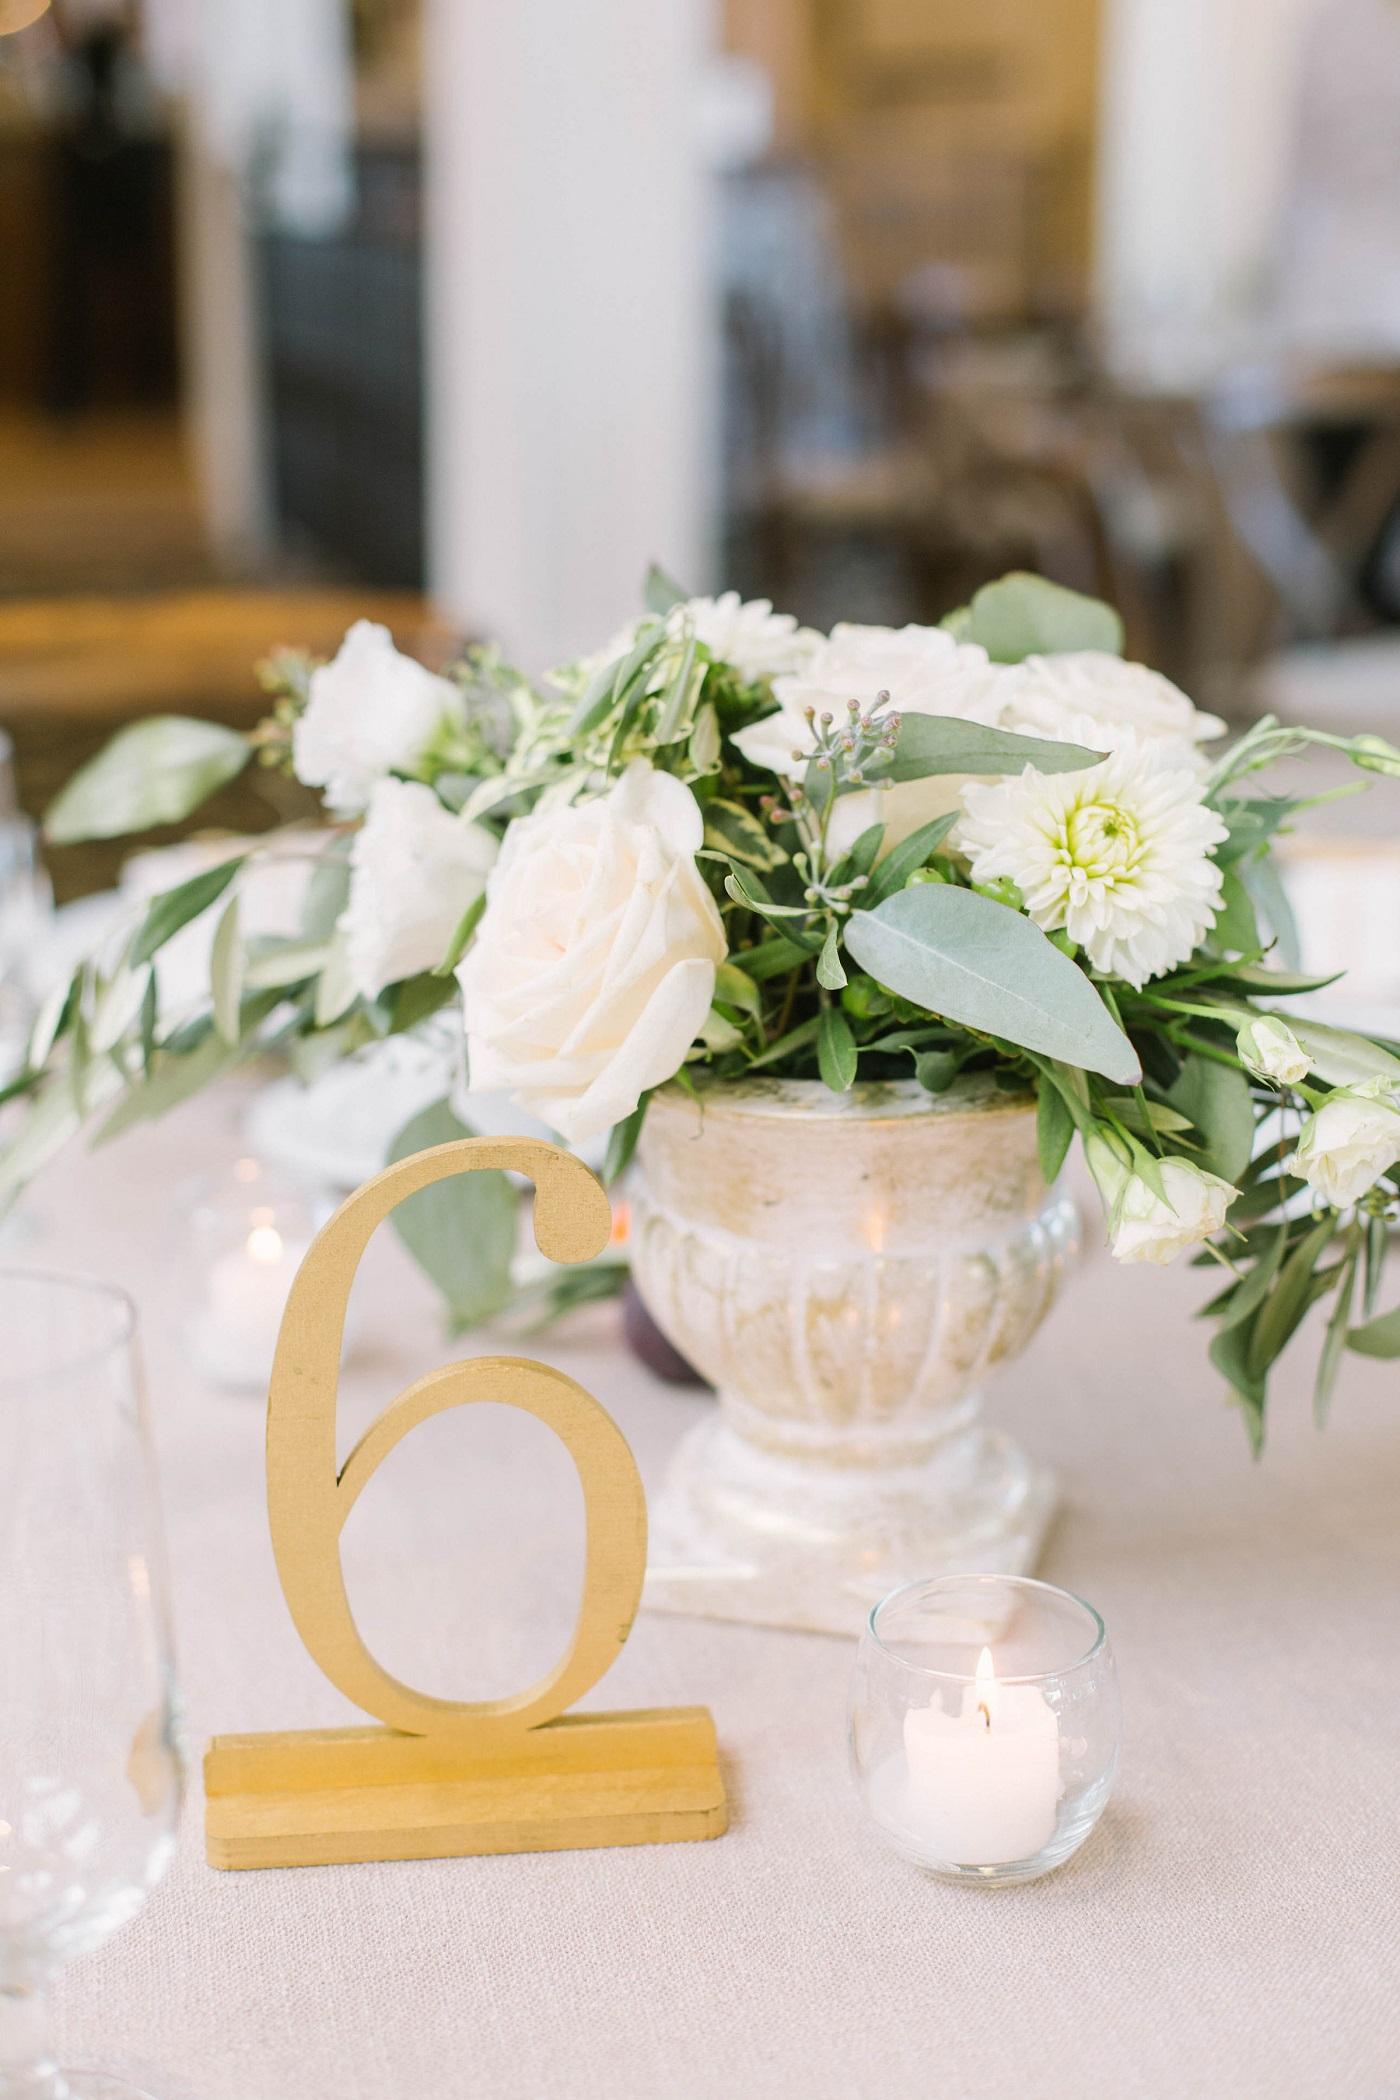 liuna-gardens-wedding-hamilton-kj-and-co-27.JPG